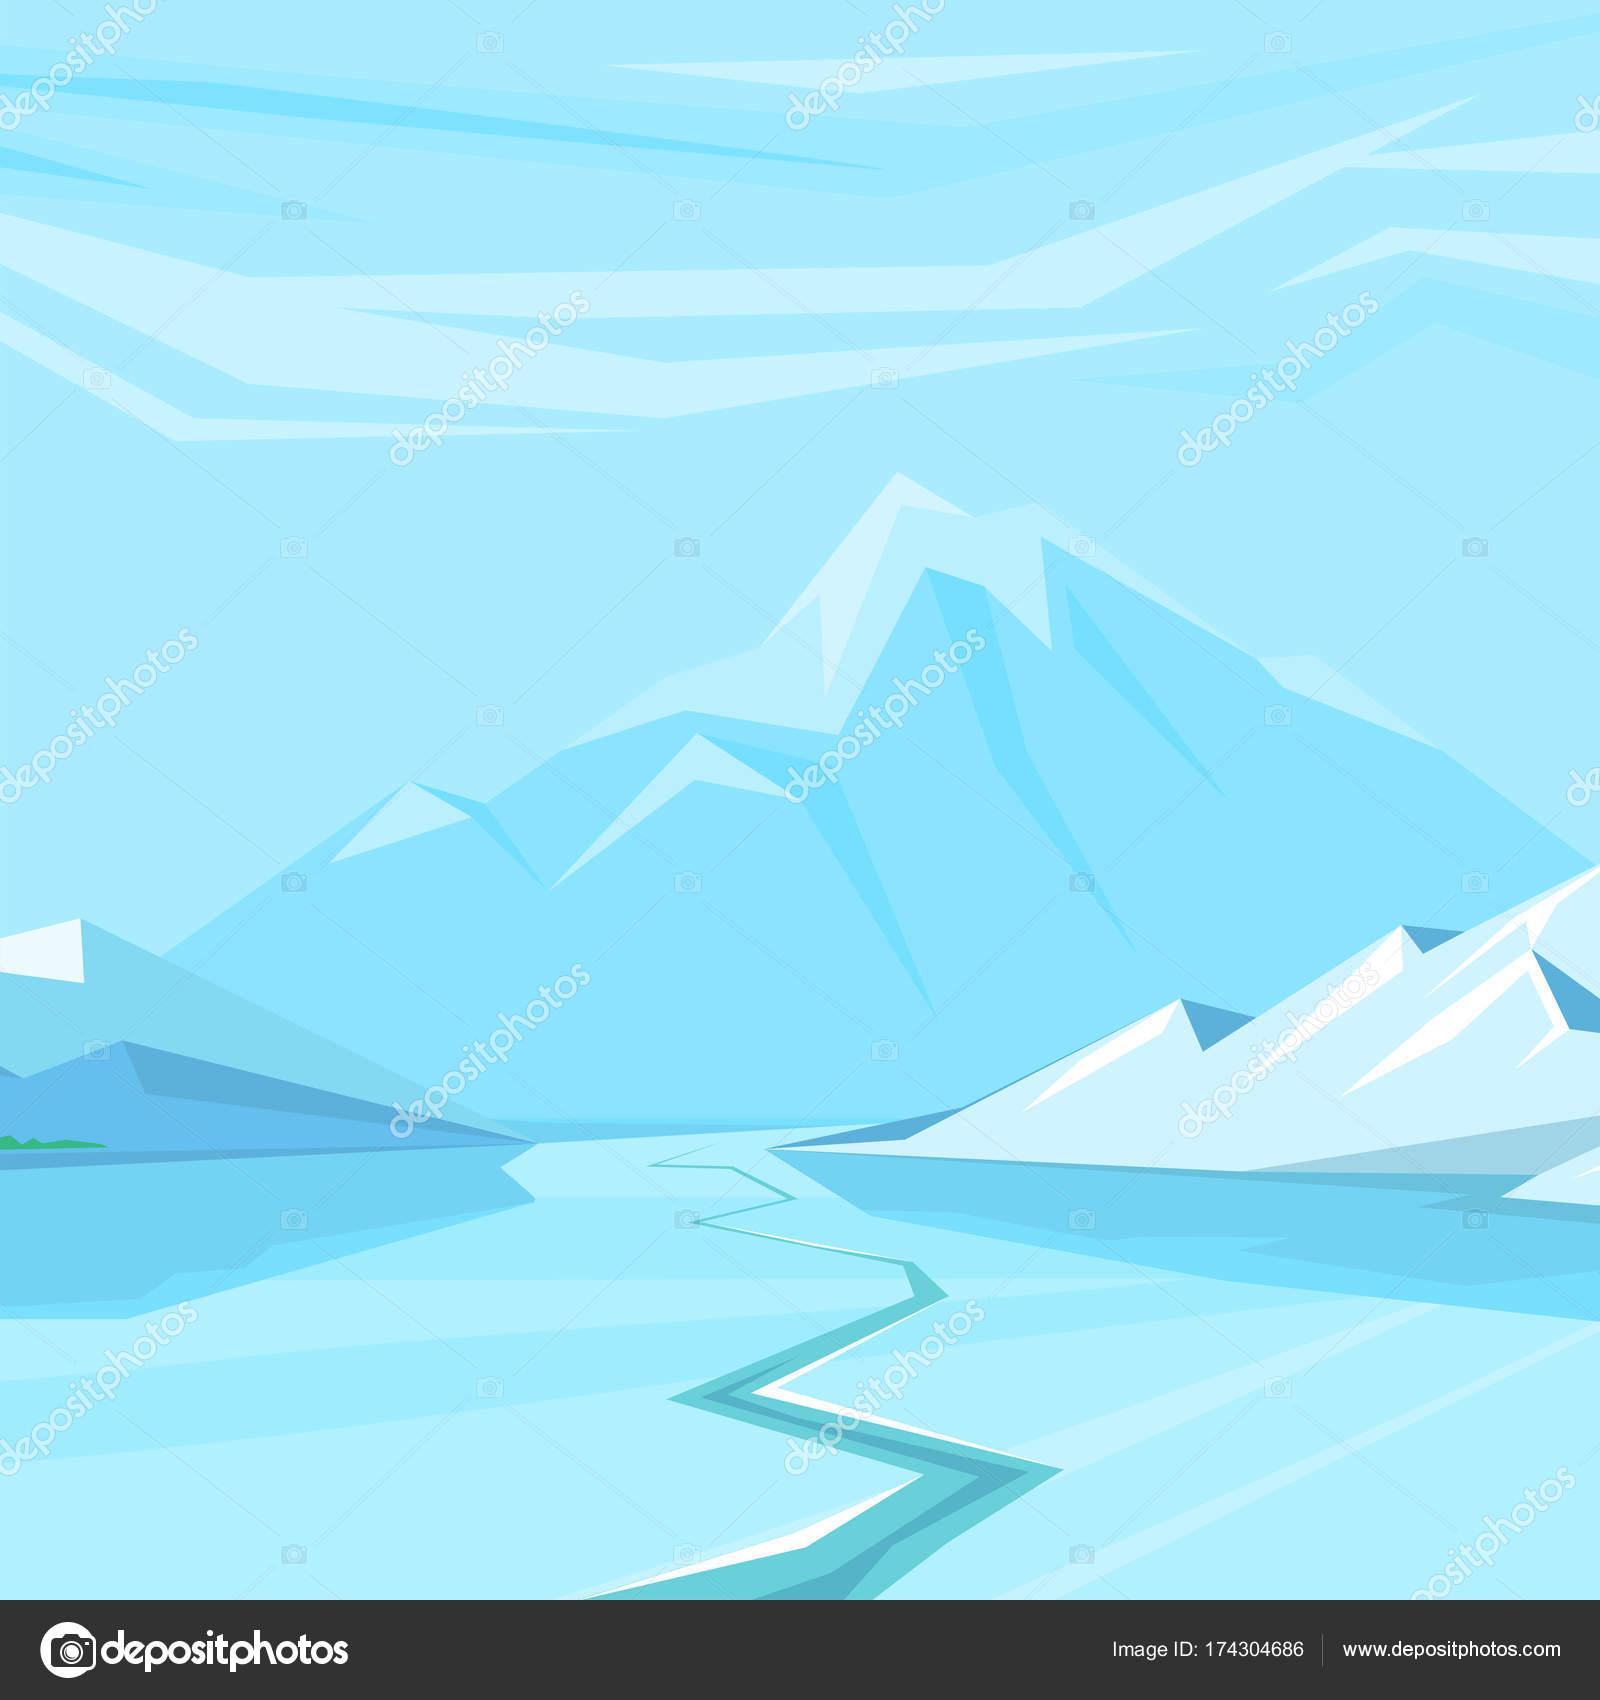 Wonderful Wallpaper Mountain Vintage - depositphotos_174304686-stock-illustration-winter-landscape-with-christmas-tree  2018_30991.jpg